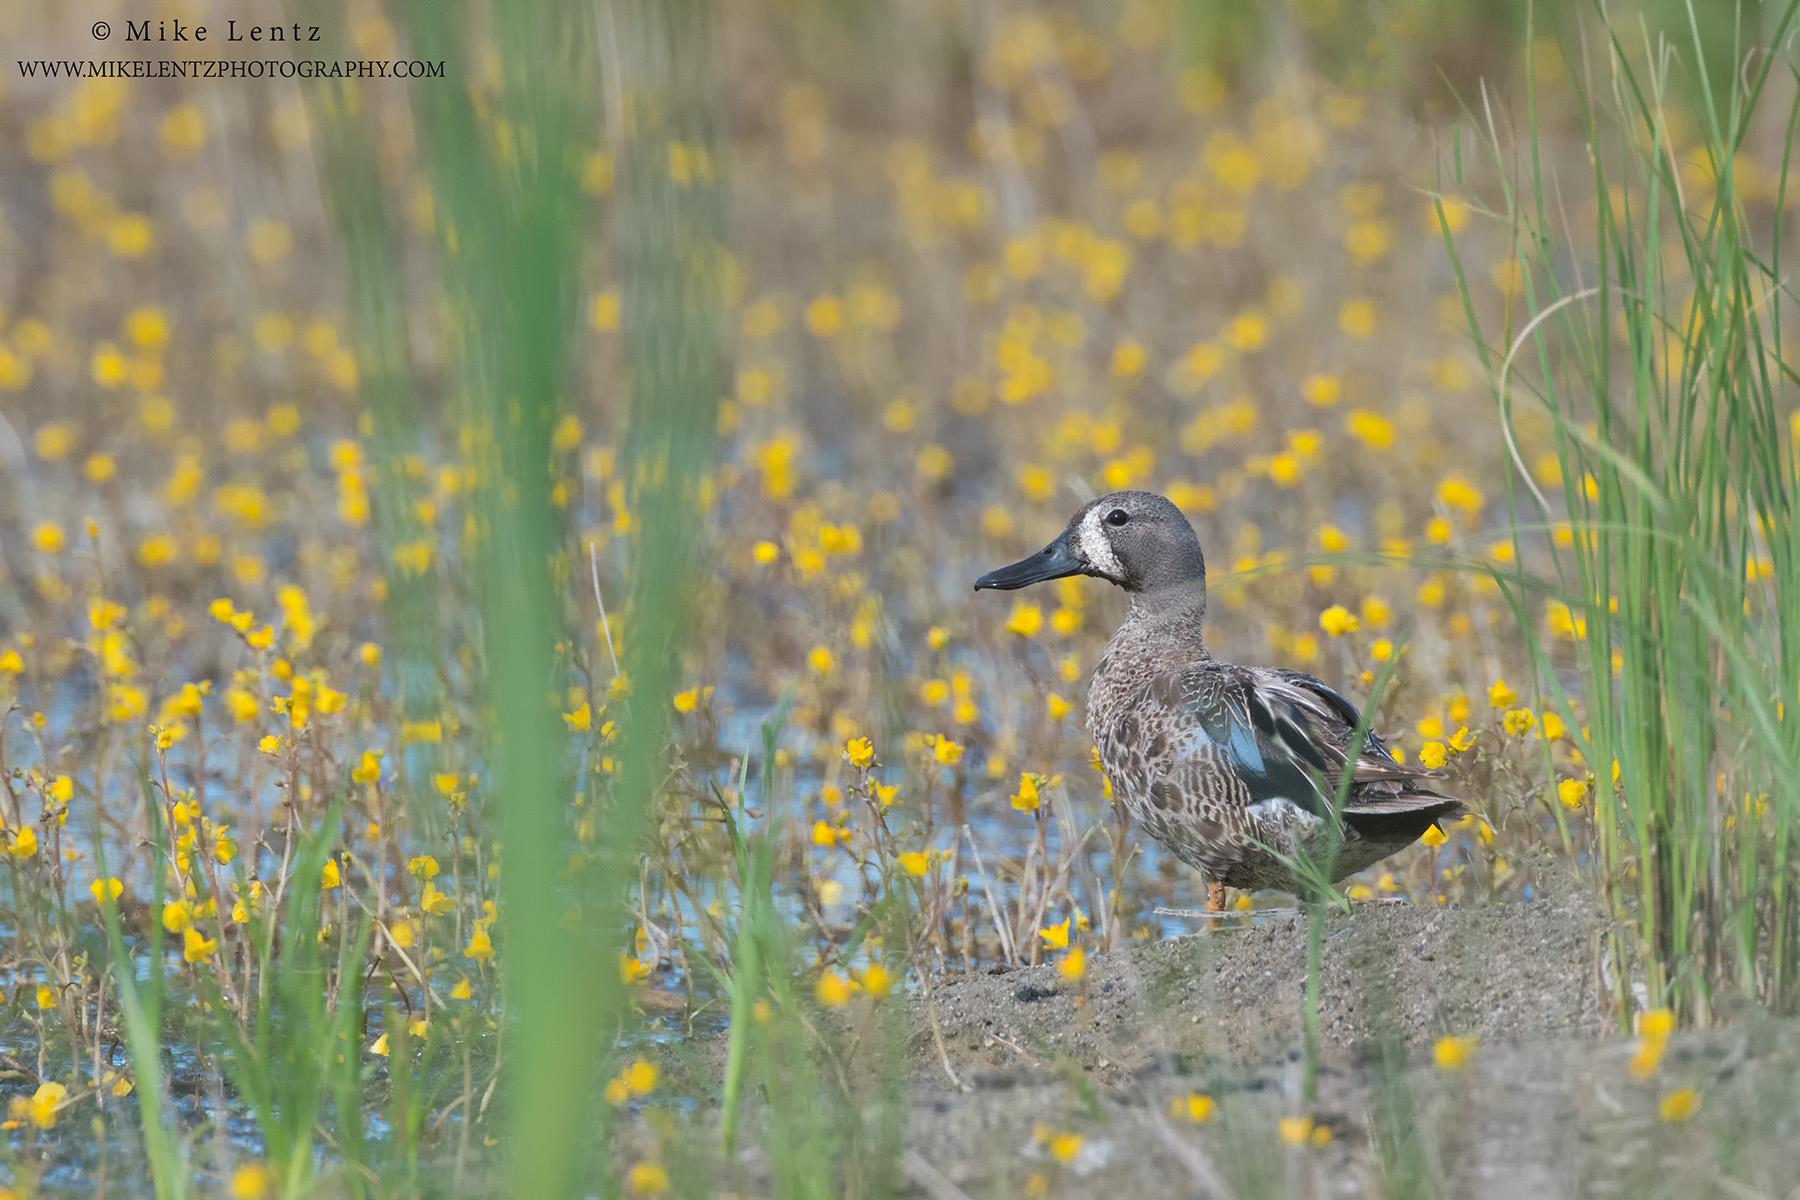 Blue-winged teal in yellow swamp flowersPS2